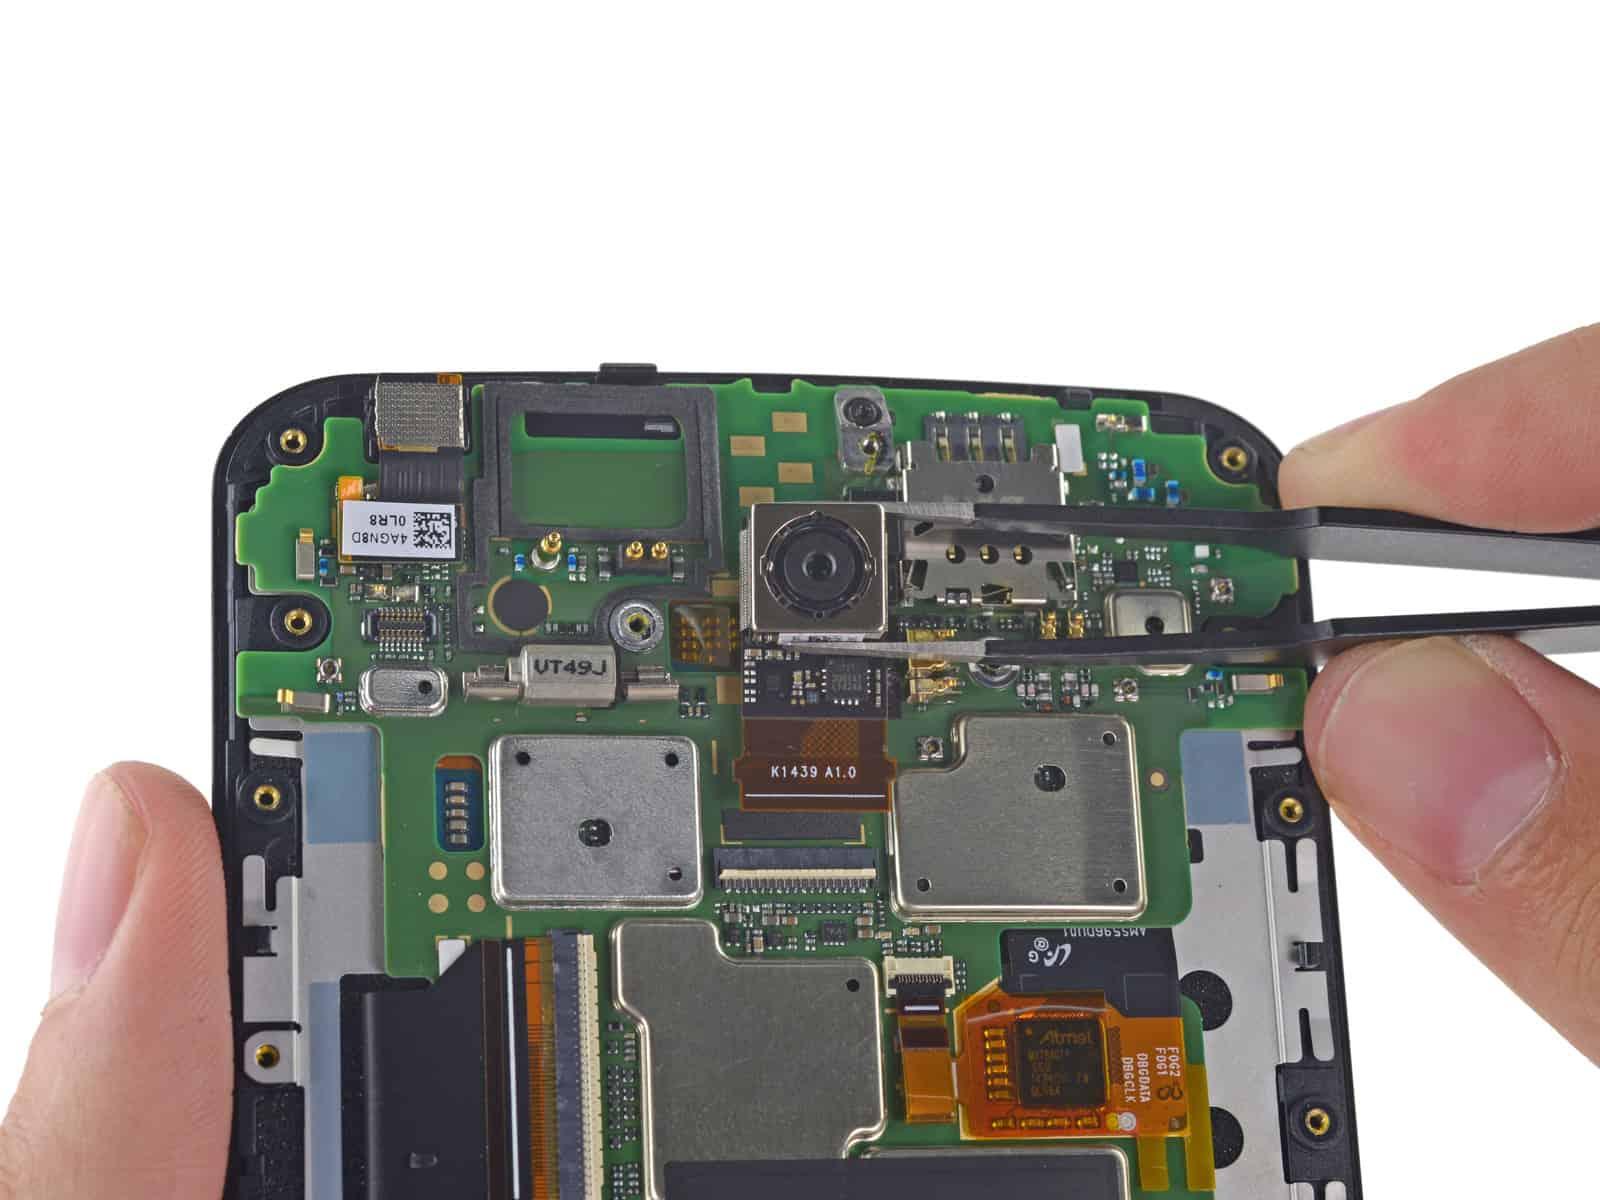 Nexus 6 iFixit teardown 8